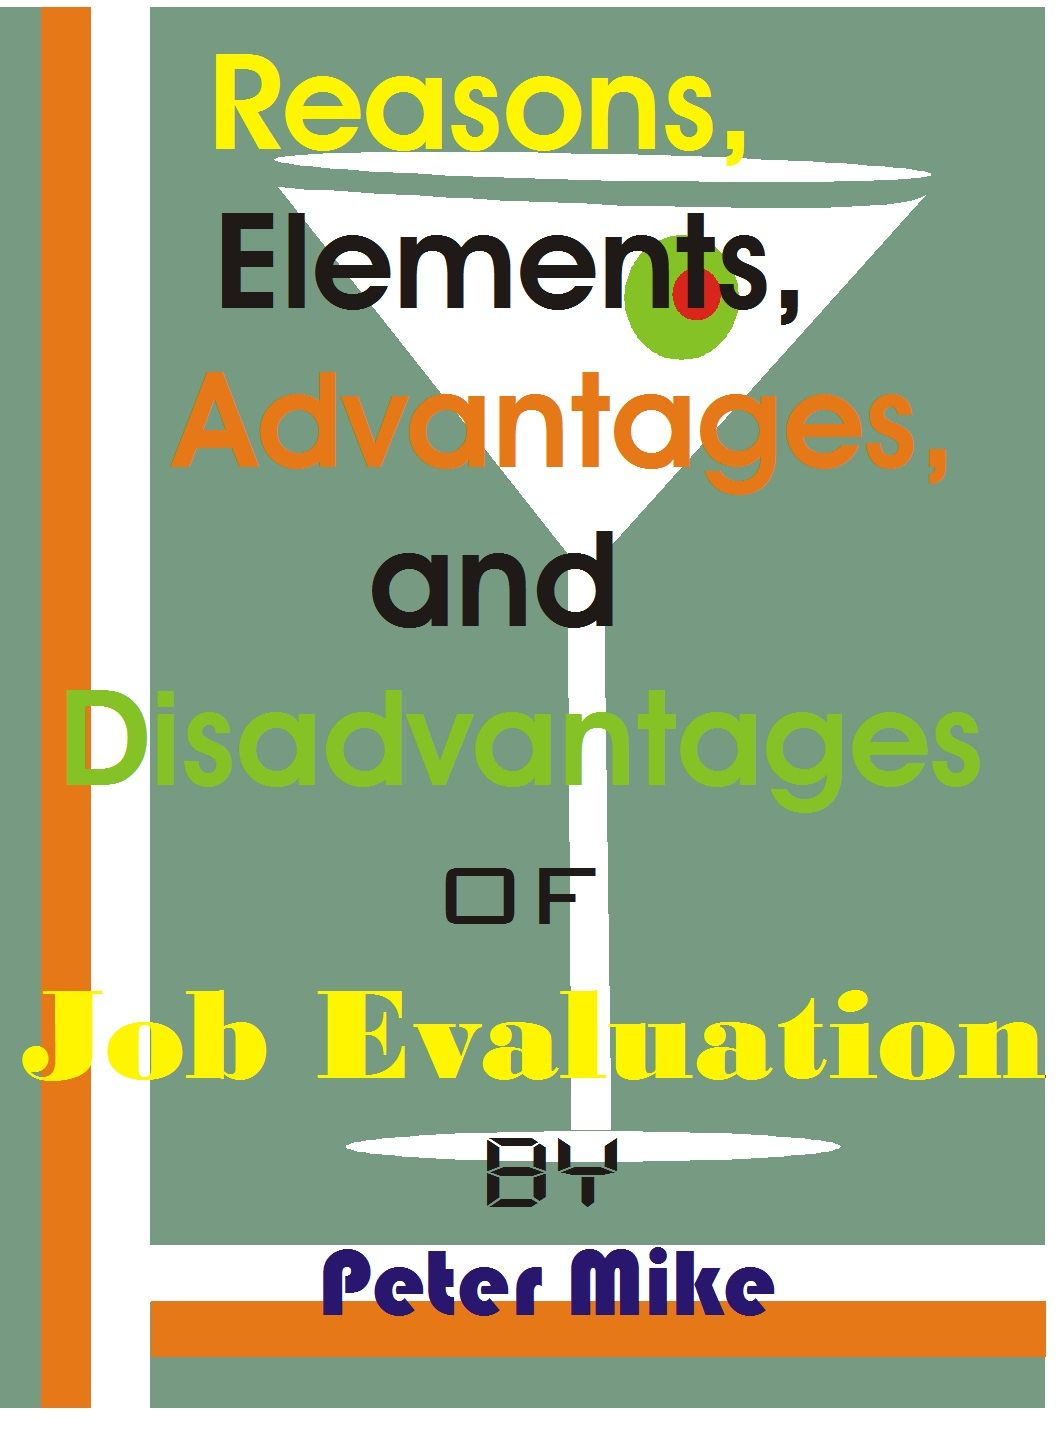 job evaluation  reasons  elements  advantages and